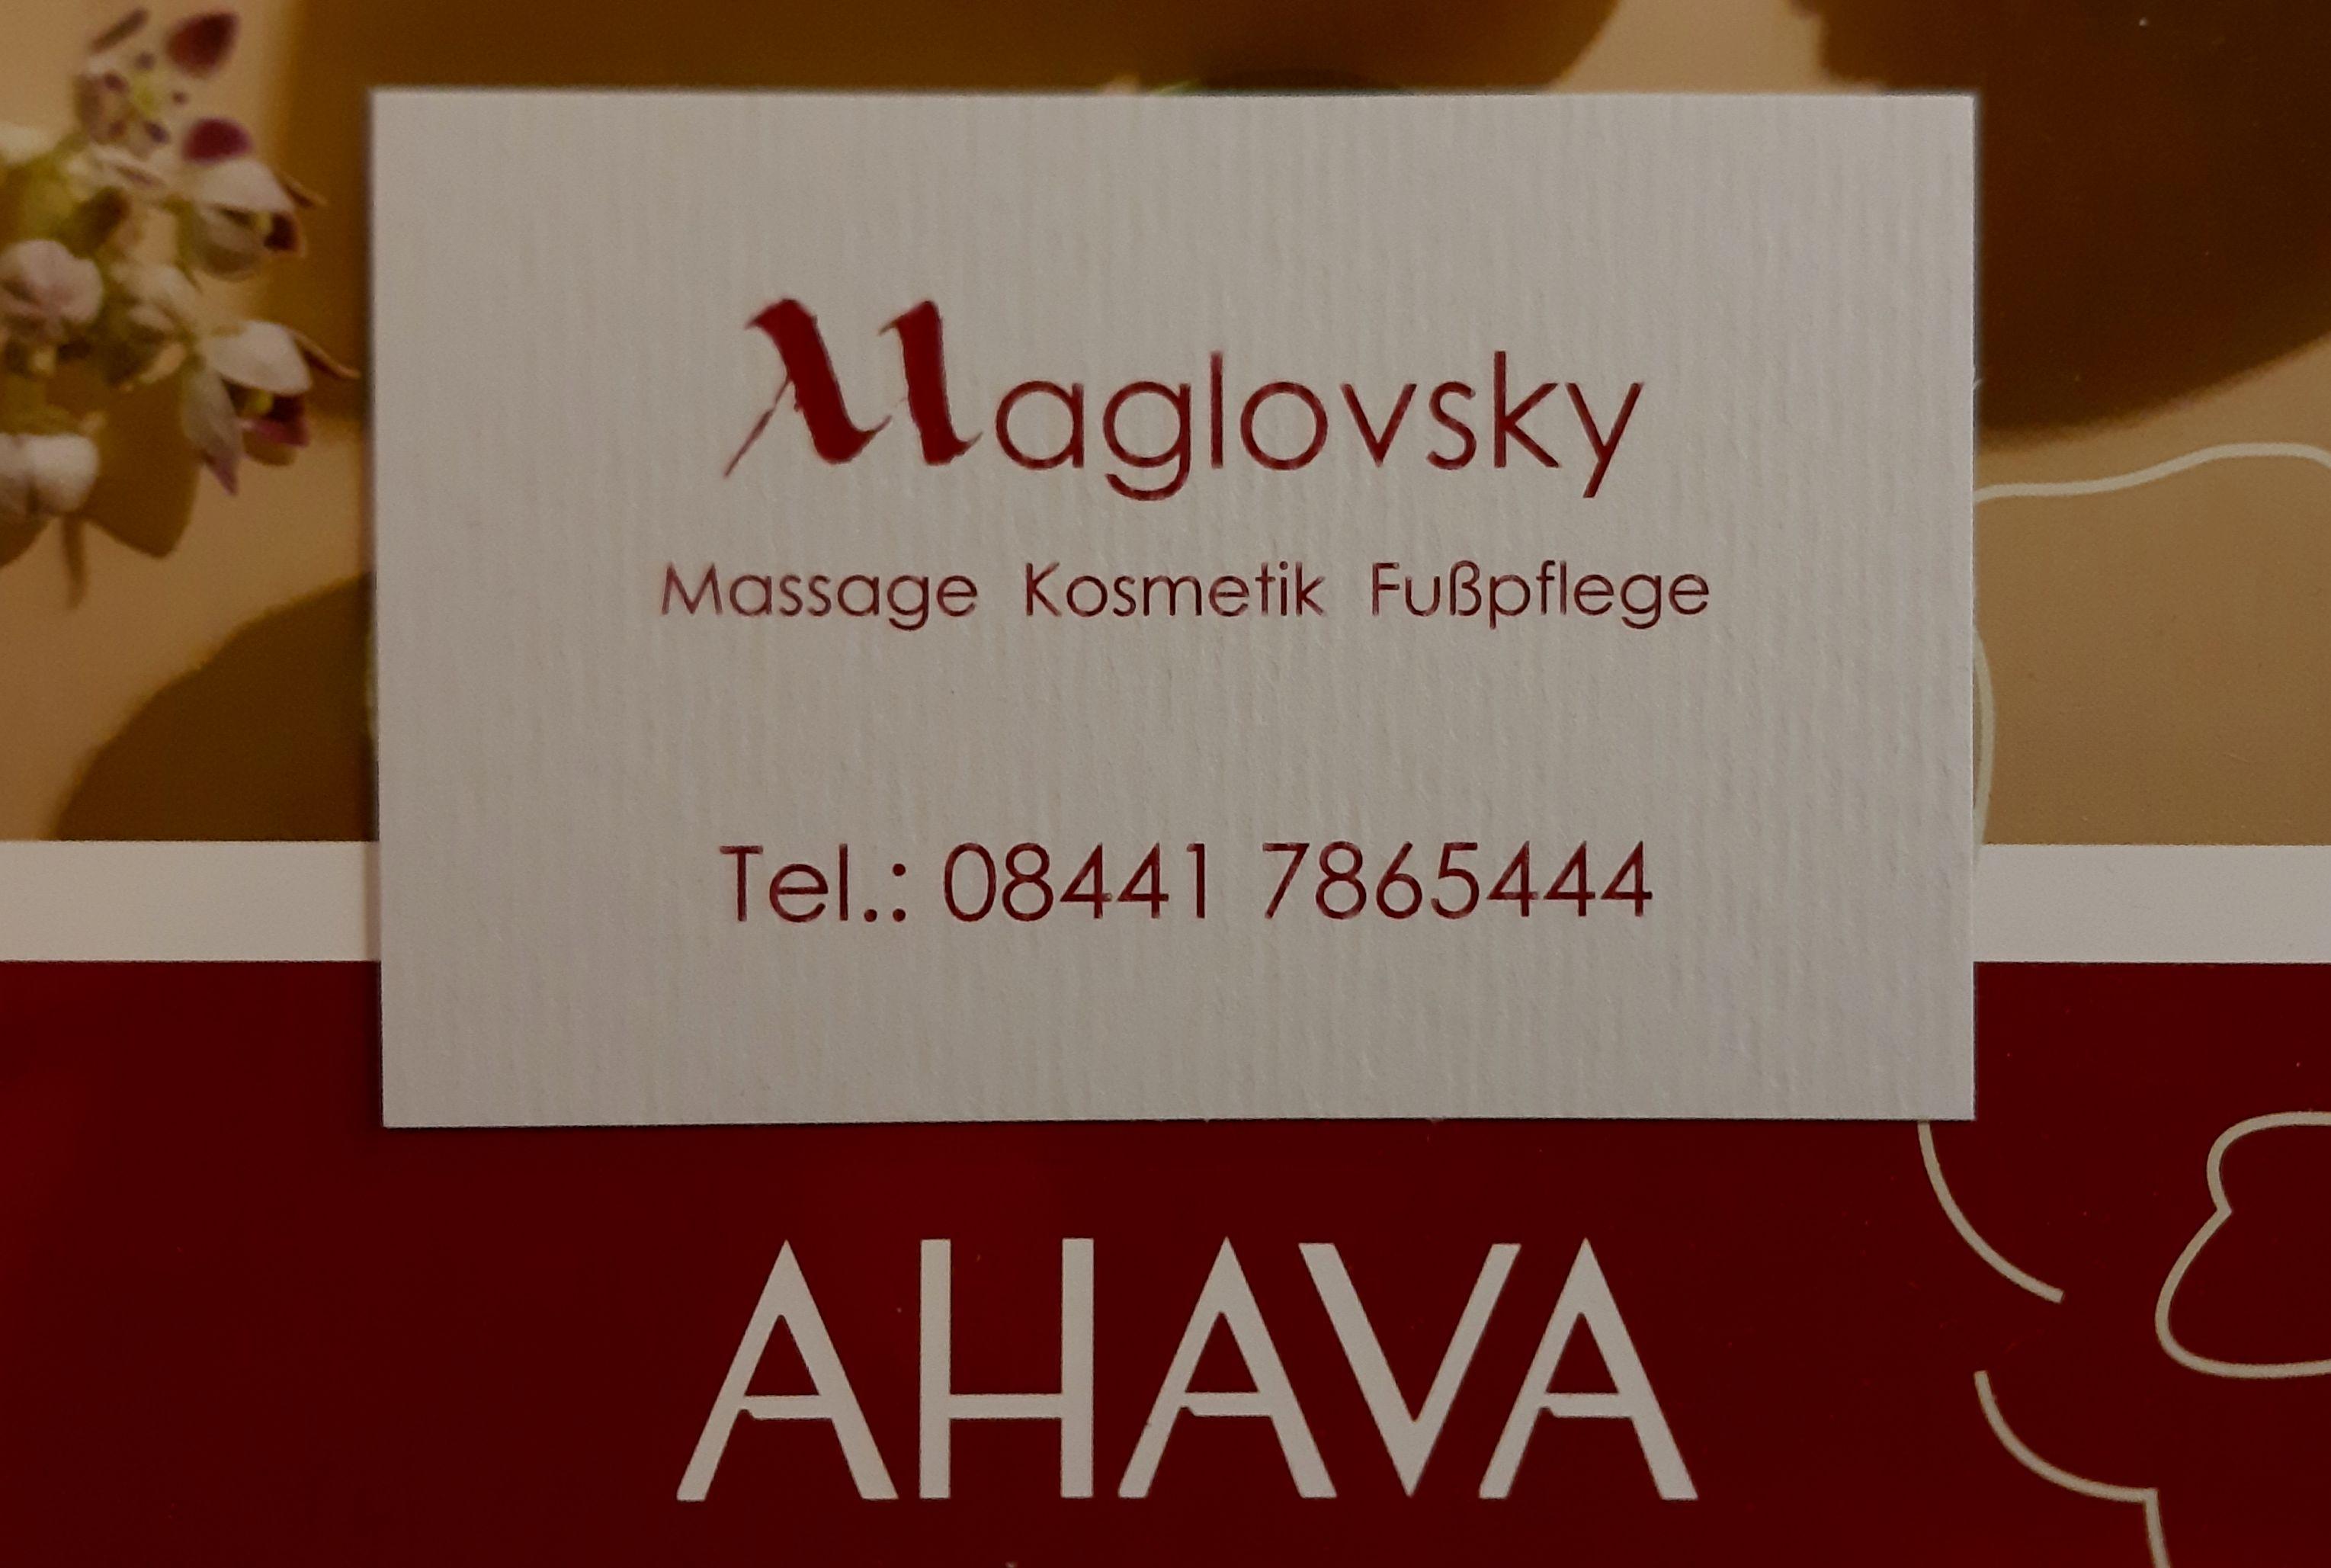 Maglovsky Massage Kosmetik Fußpflege